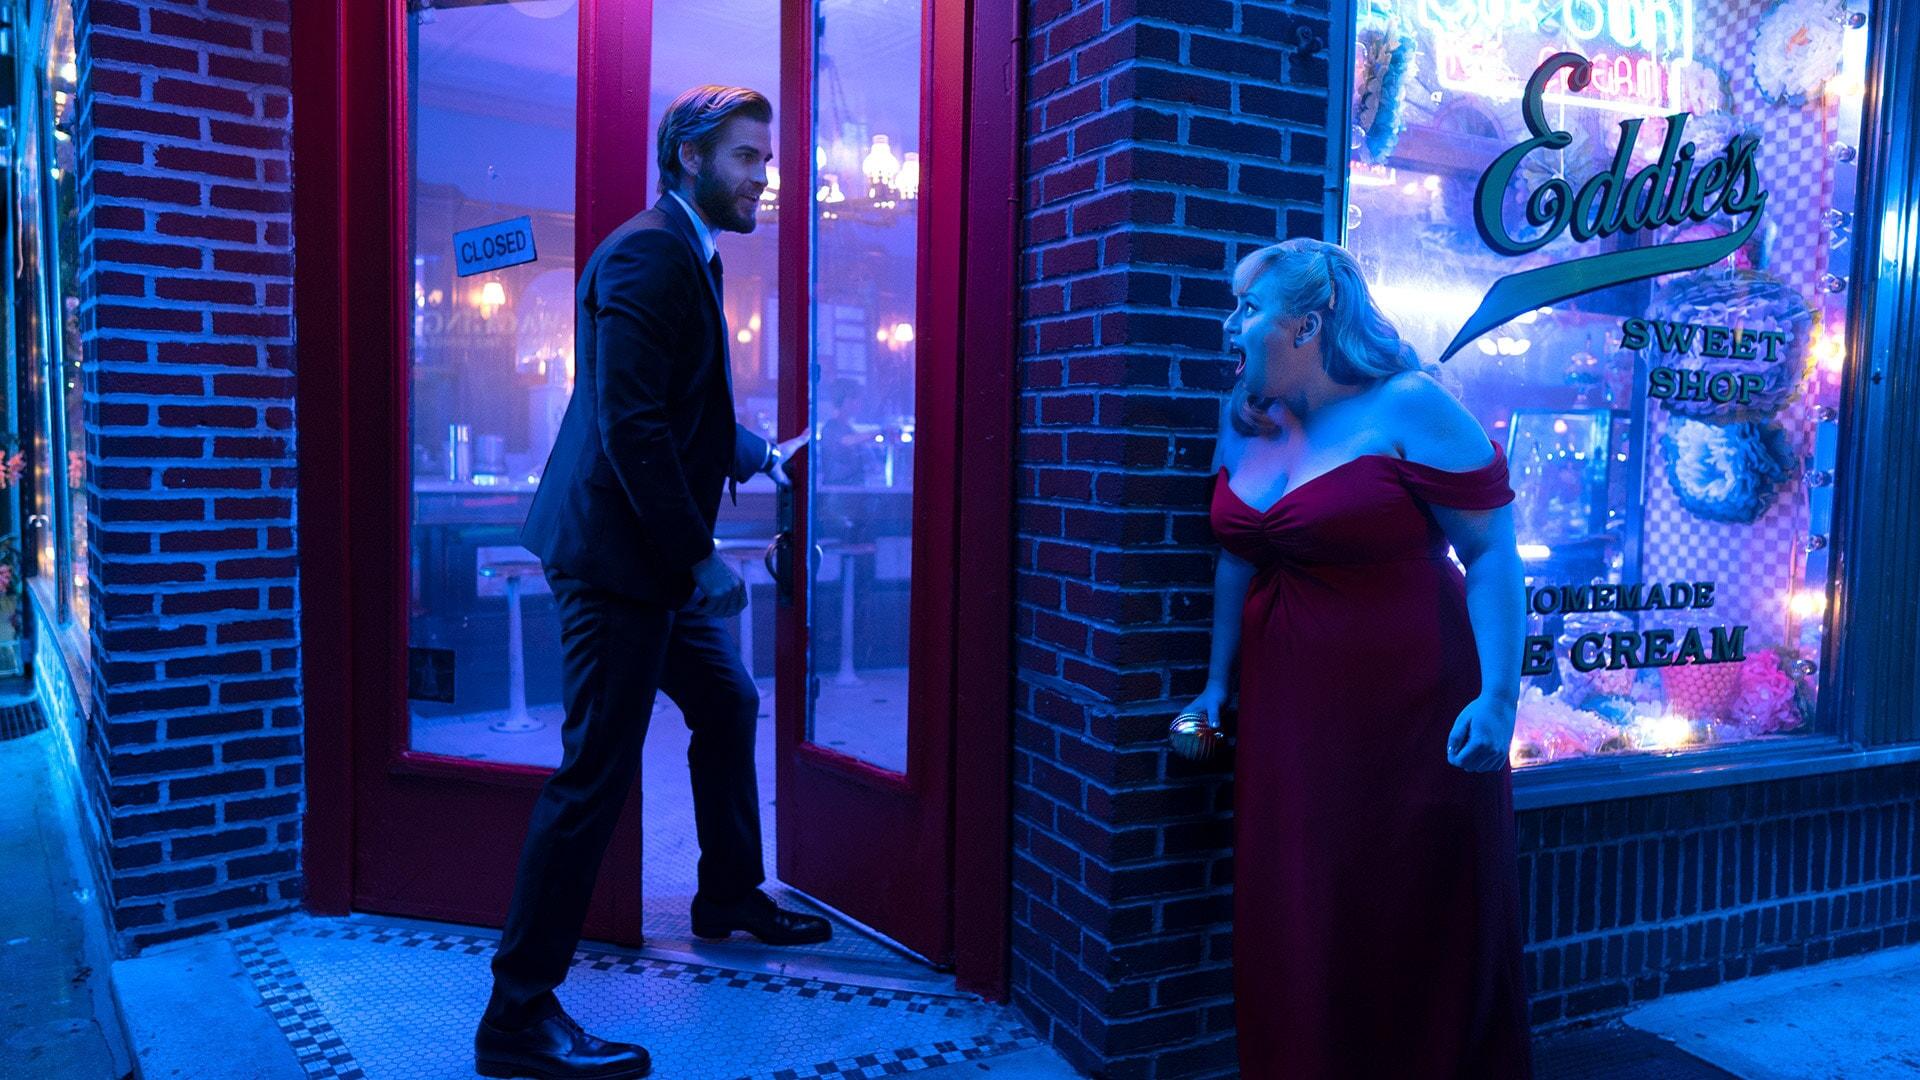 (L-R) LIAM HEMSWORTH as Blake and REBEL WILSON as Natalie